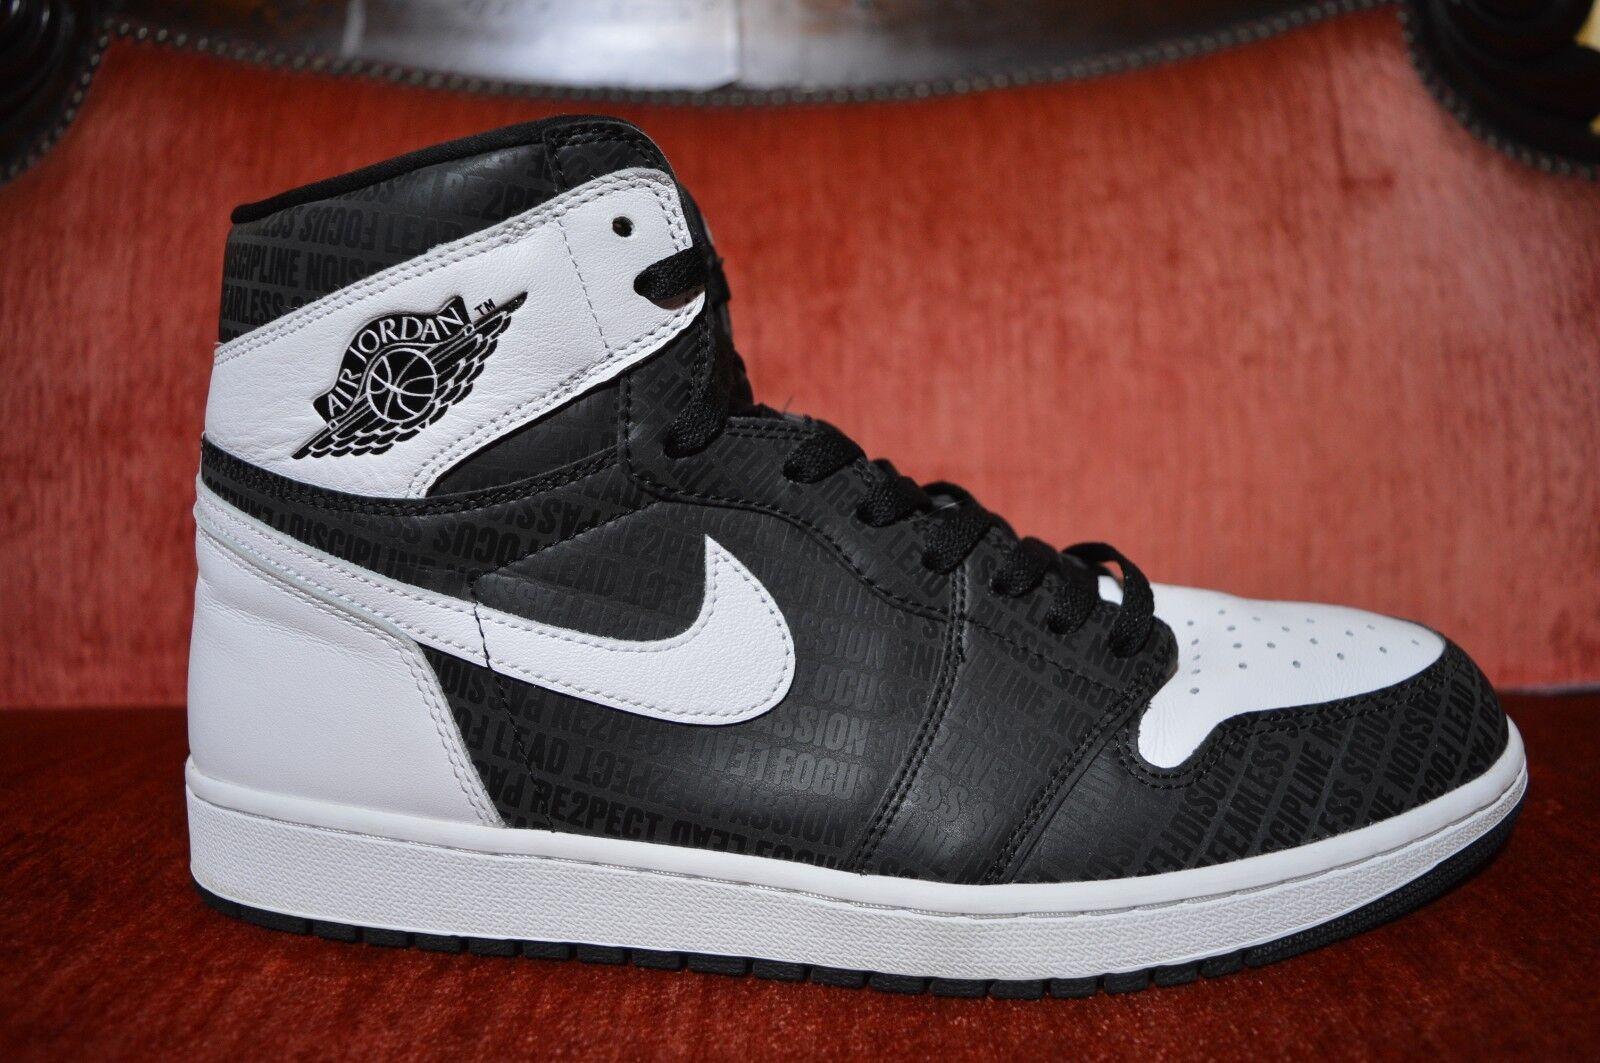 CLEAN Nike Air Jordan Retro 1 High Jeter Re2pect Respect 555088-008 Size 14